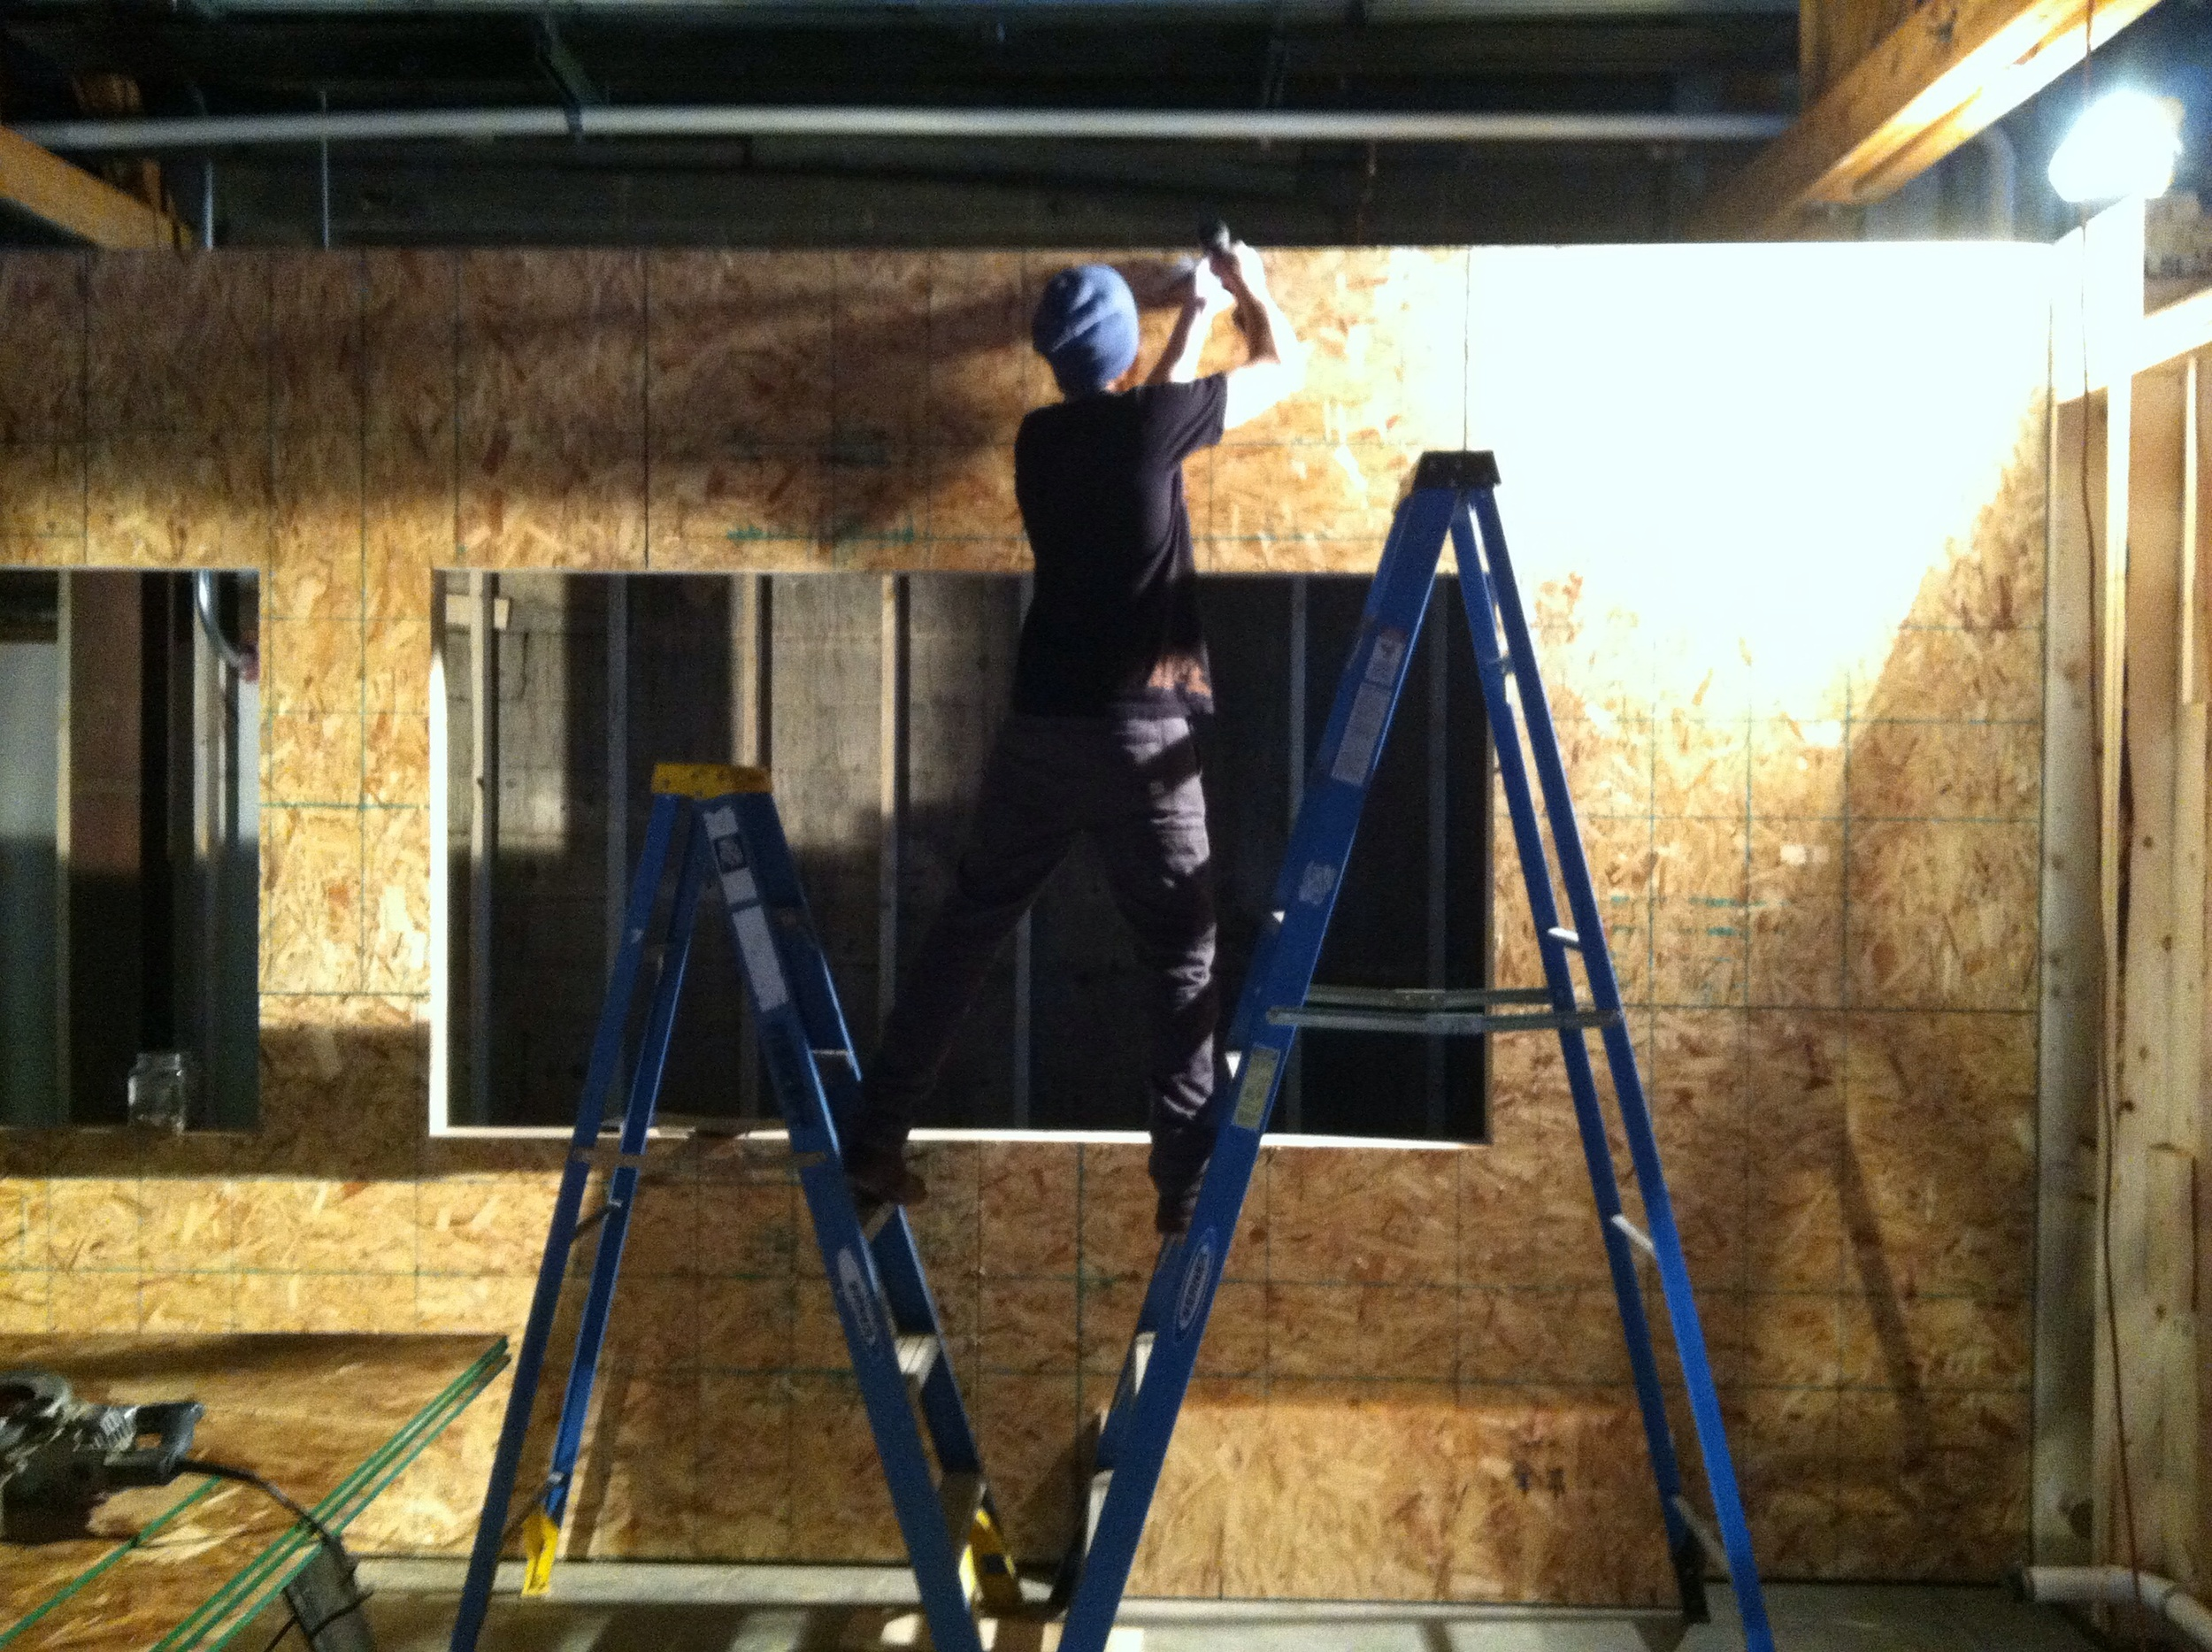 Joe Sheehan installing 5/8ths OSB on north side of hallway. (Two ladder man)